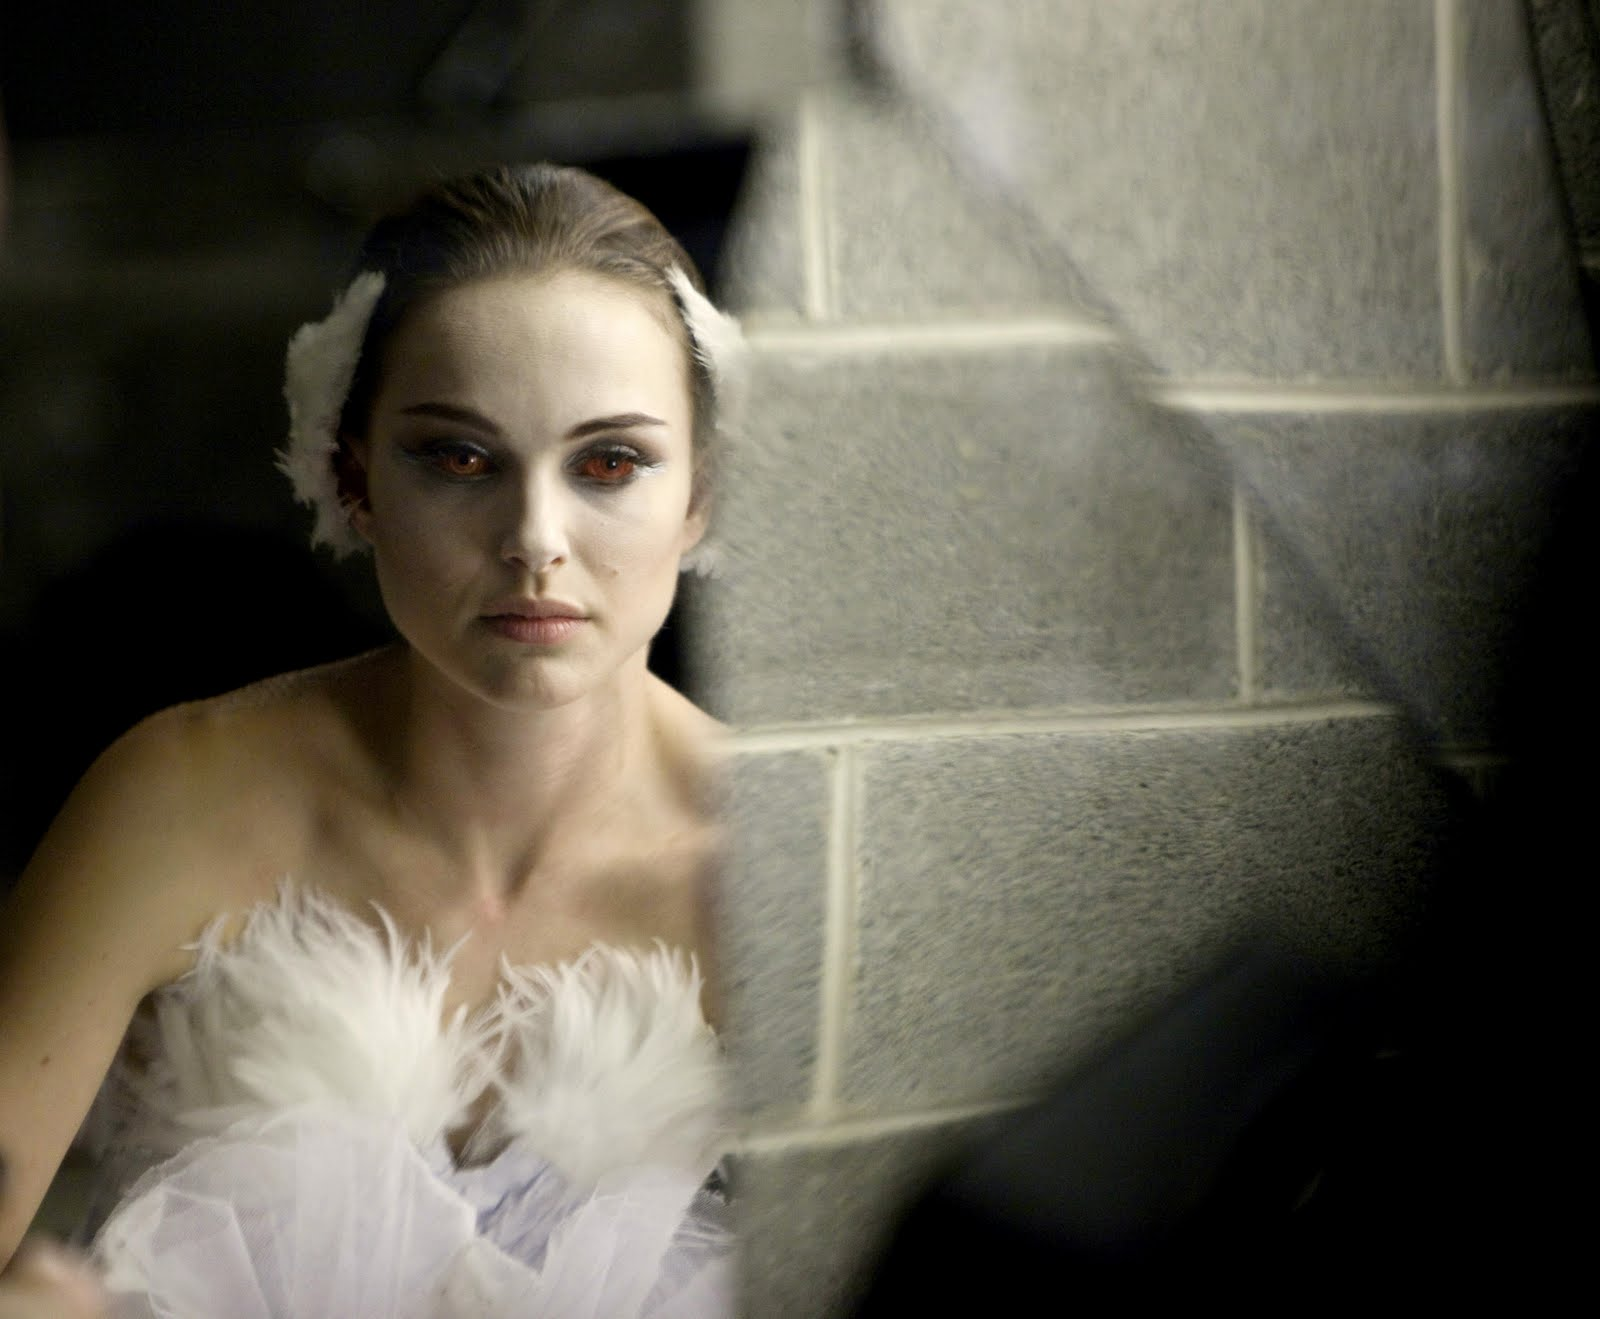 http://1.bp.blogspot.com/_hqS11yCxnQ8/THbdFXZL8SI/AAAAAAAAN84/w0QyMpyhBys/s1600/black_swan+4.jpg